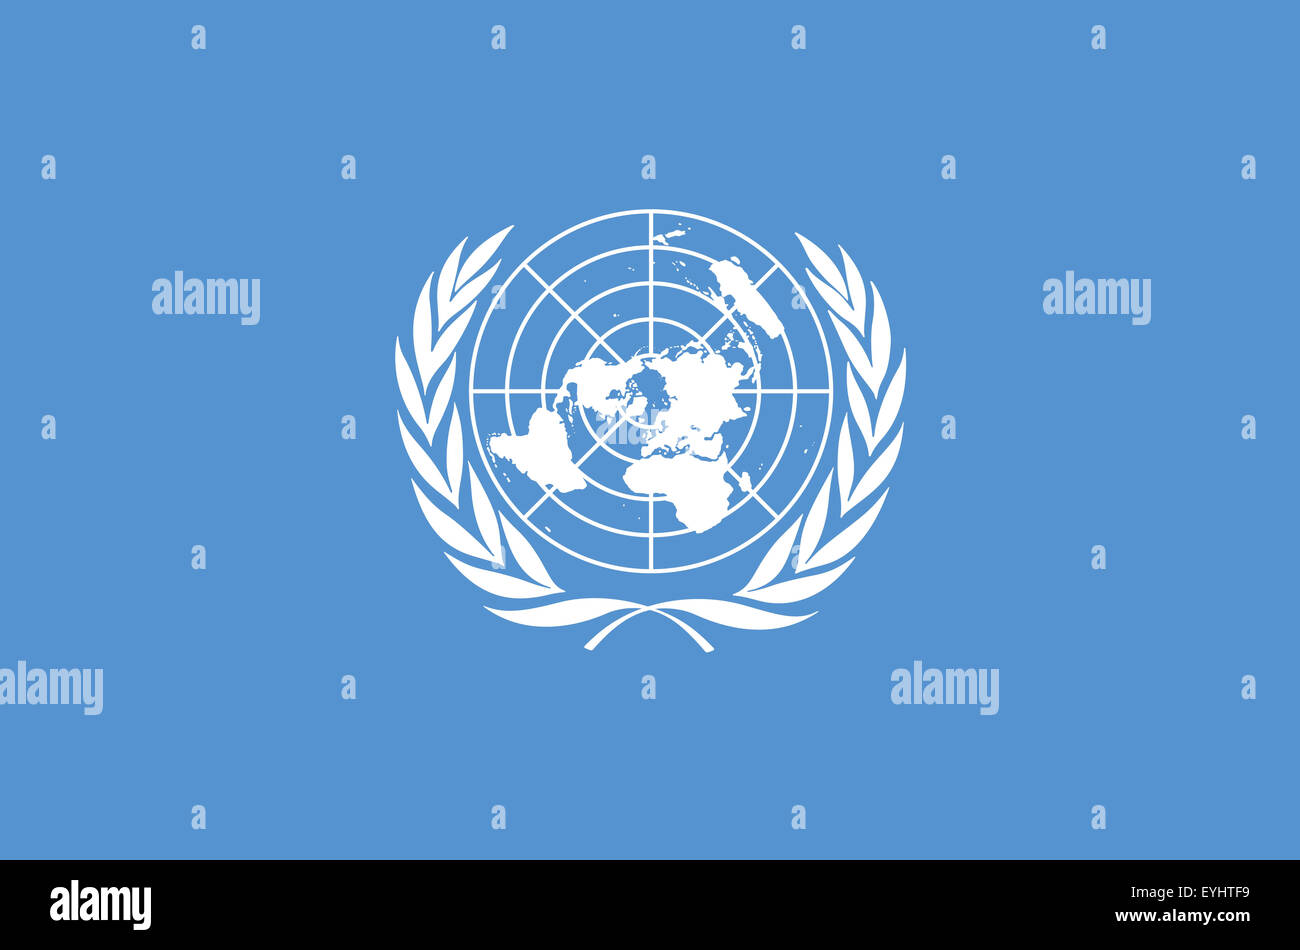 Fahne: Vereinte Nationen/ flag: United Nations. - Stock Image